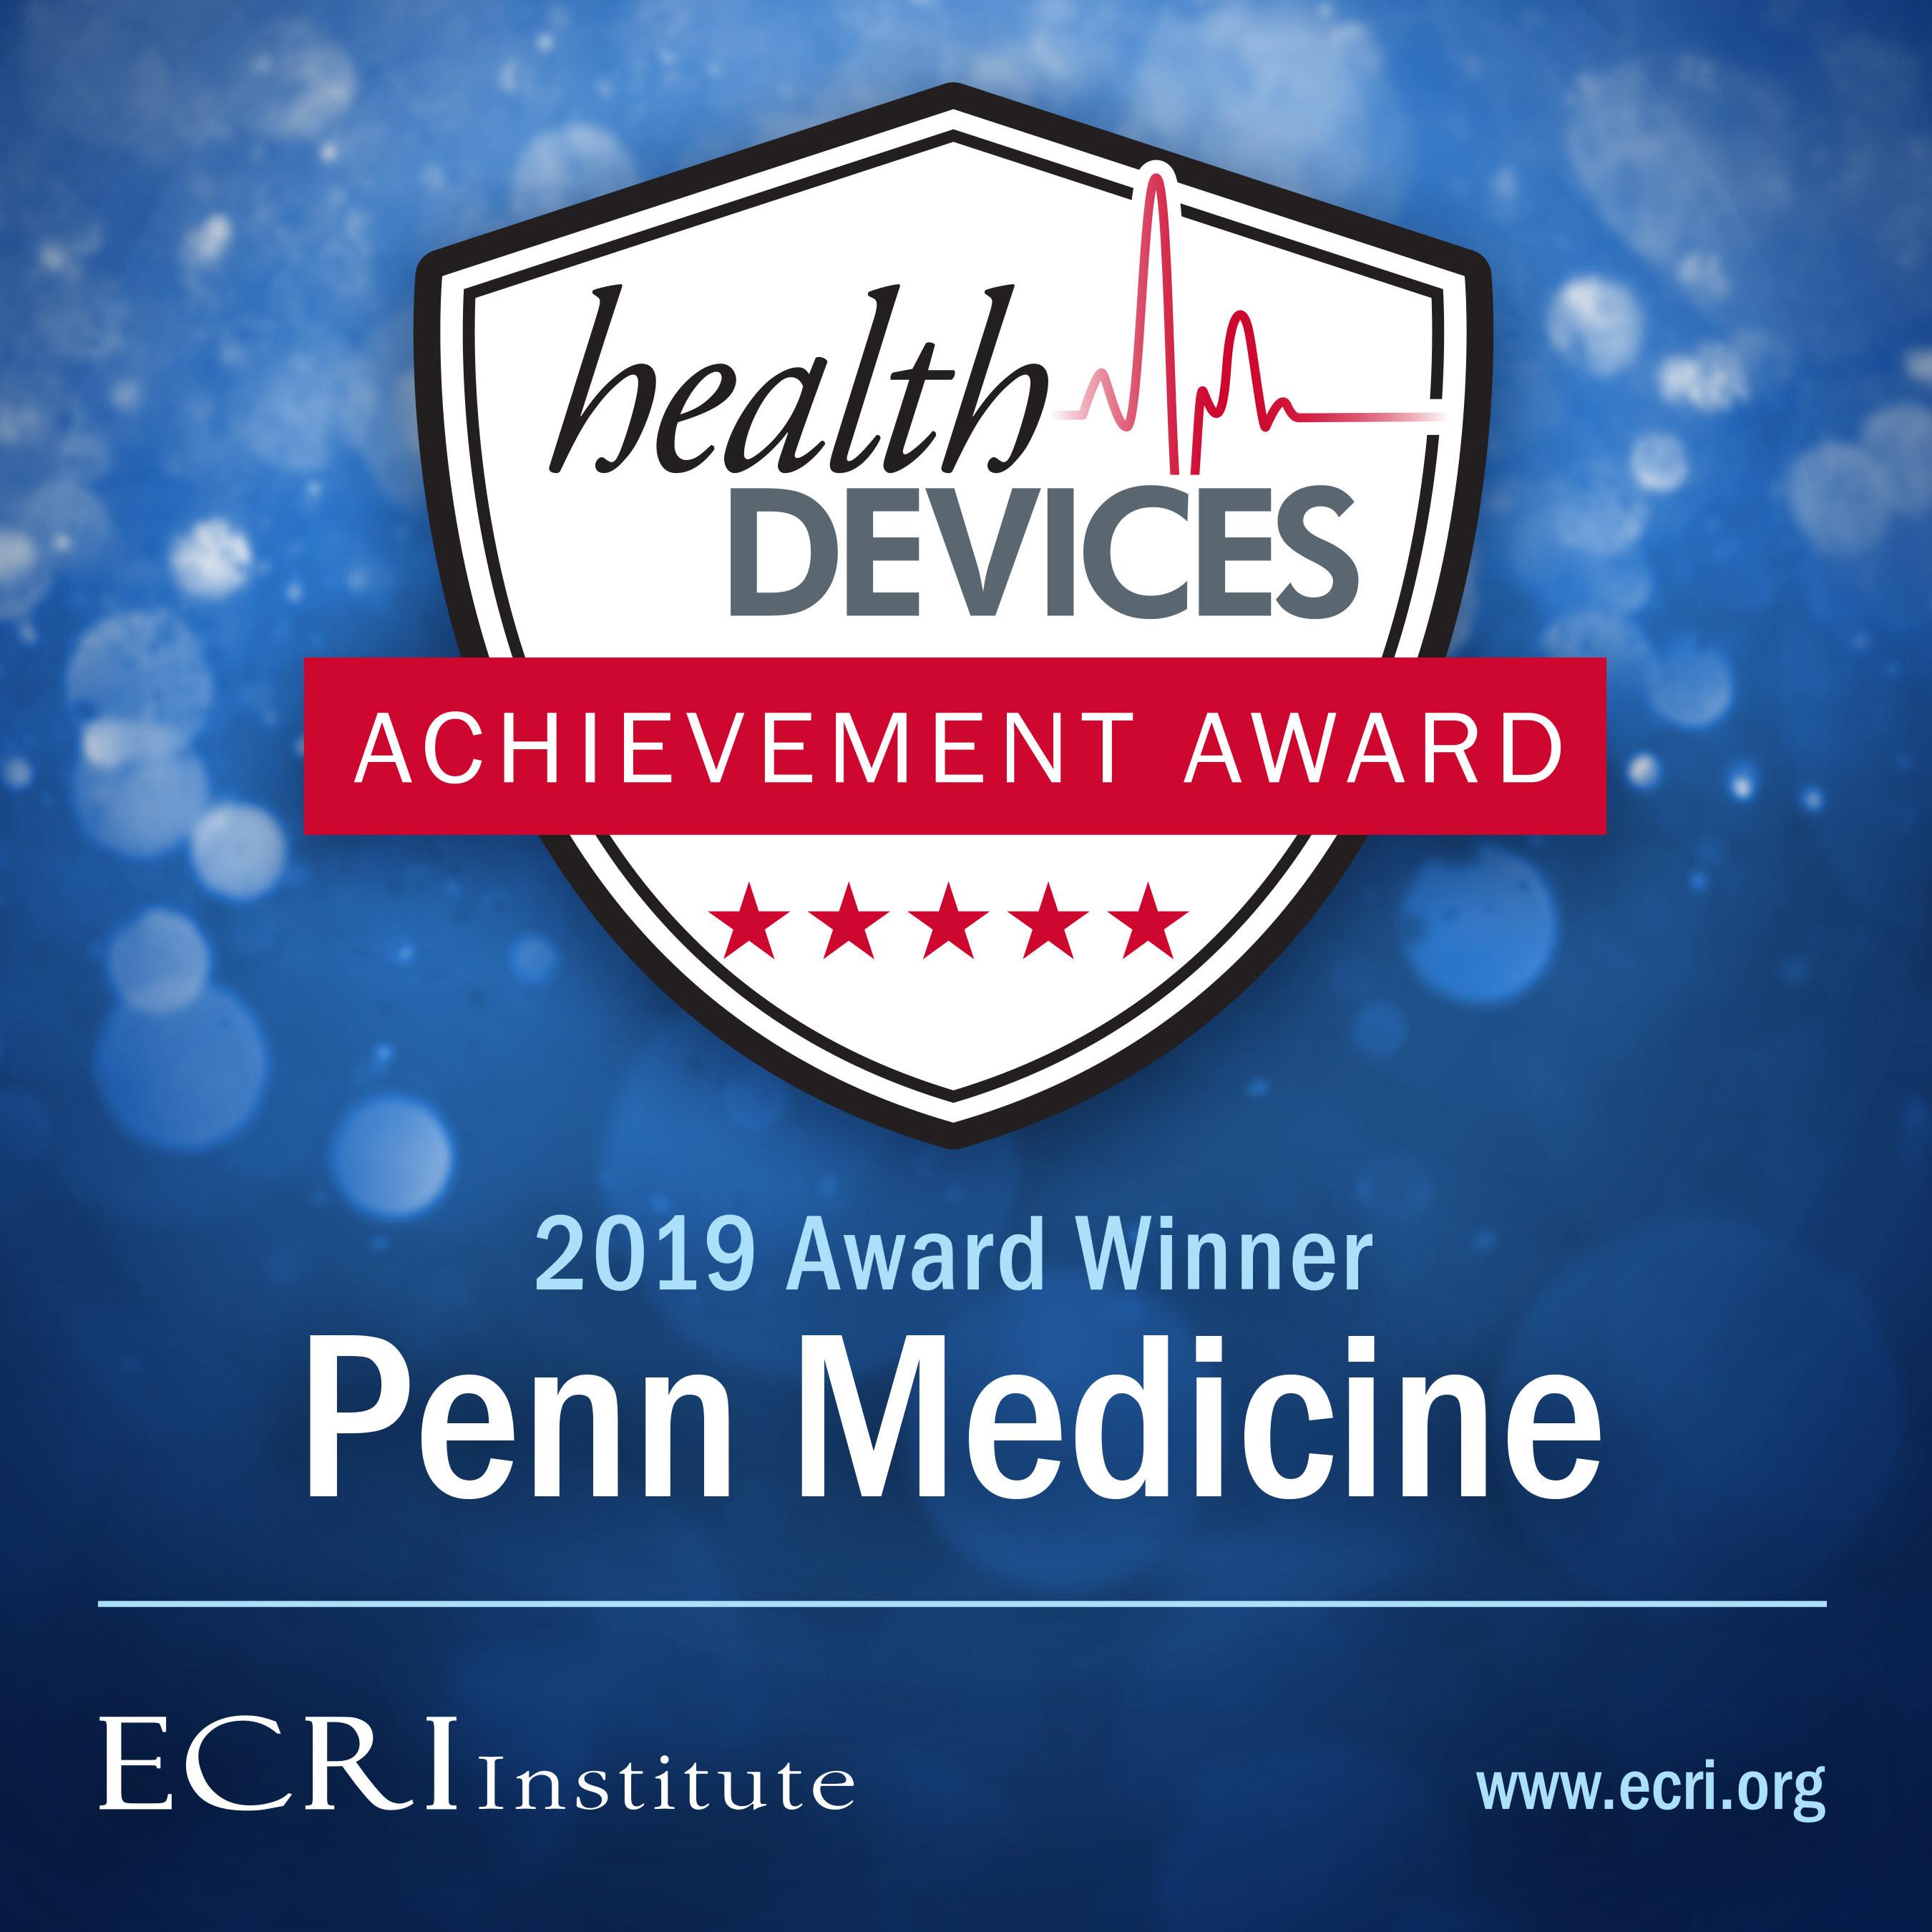 ECRI Institute Names Penn Medicine Winner of Health Devices